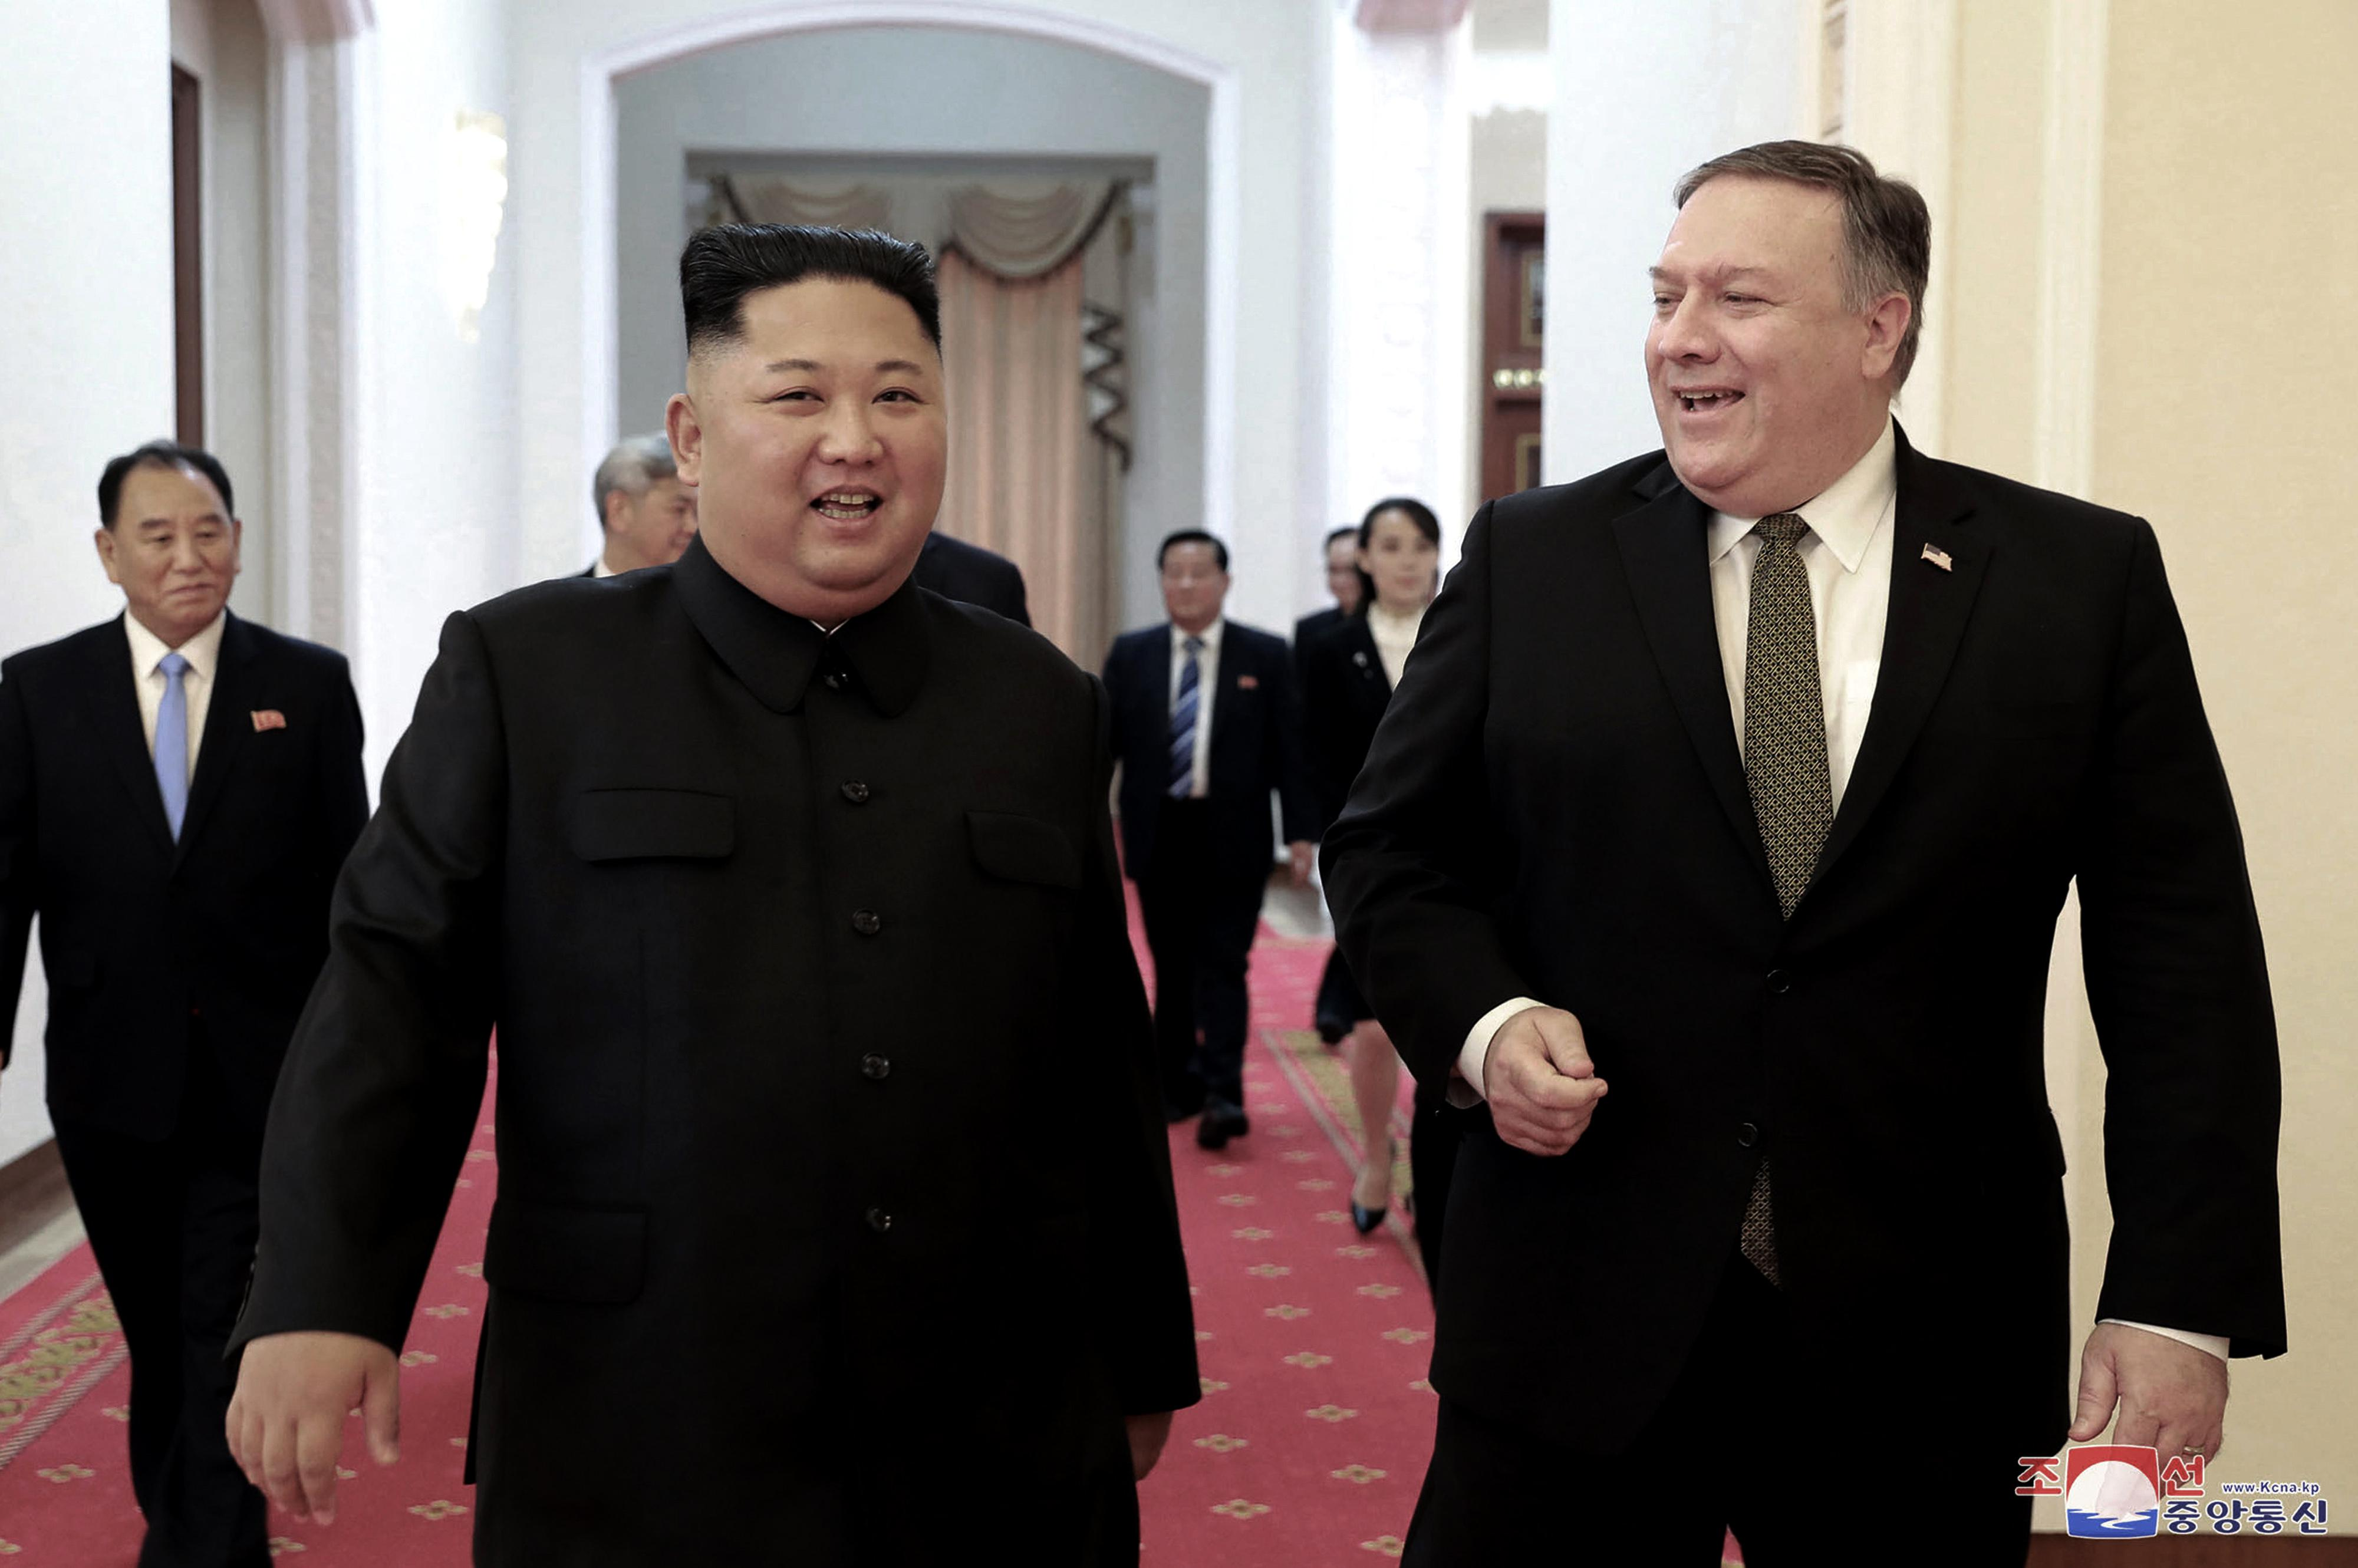 Kim regime slams Pompeo, sanctions, despite 'behind-the-scenes' talks